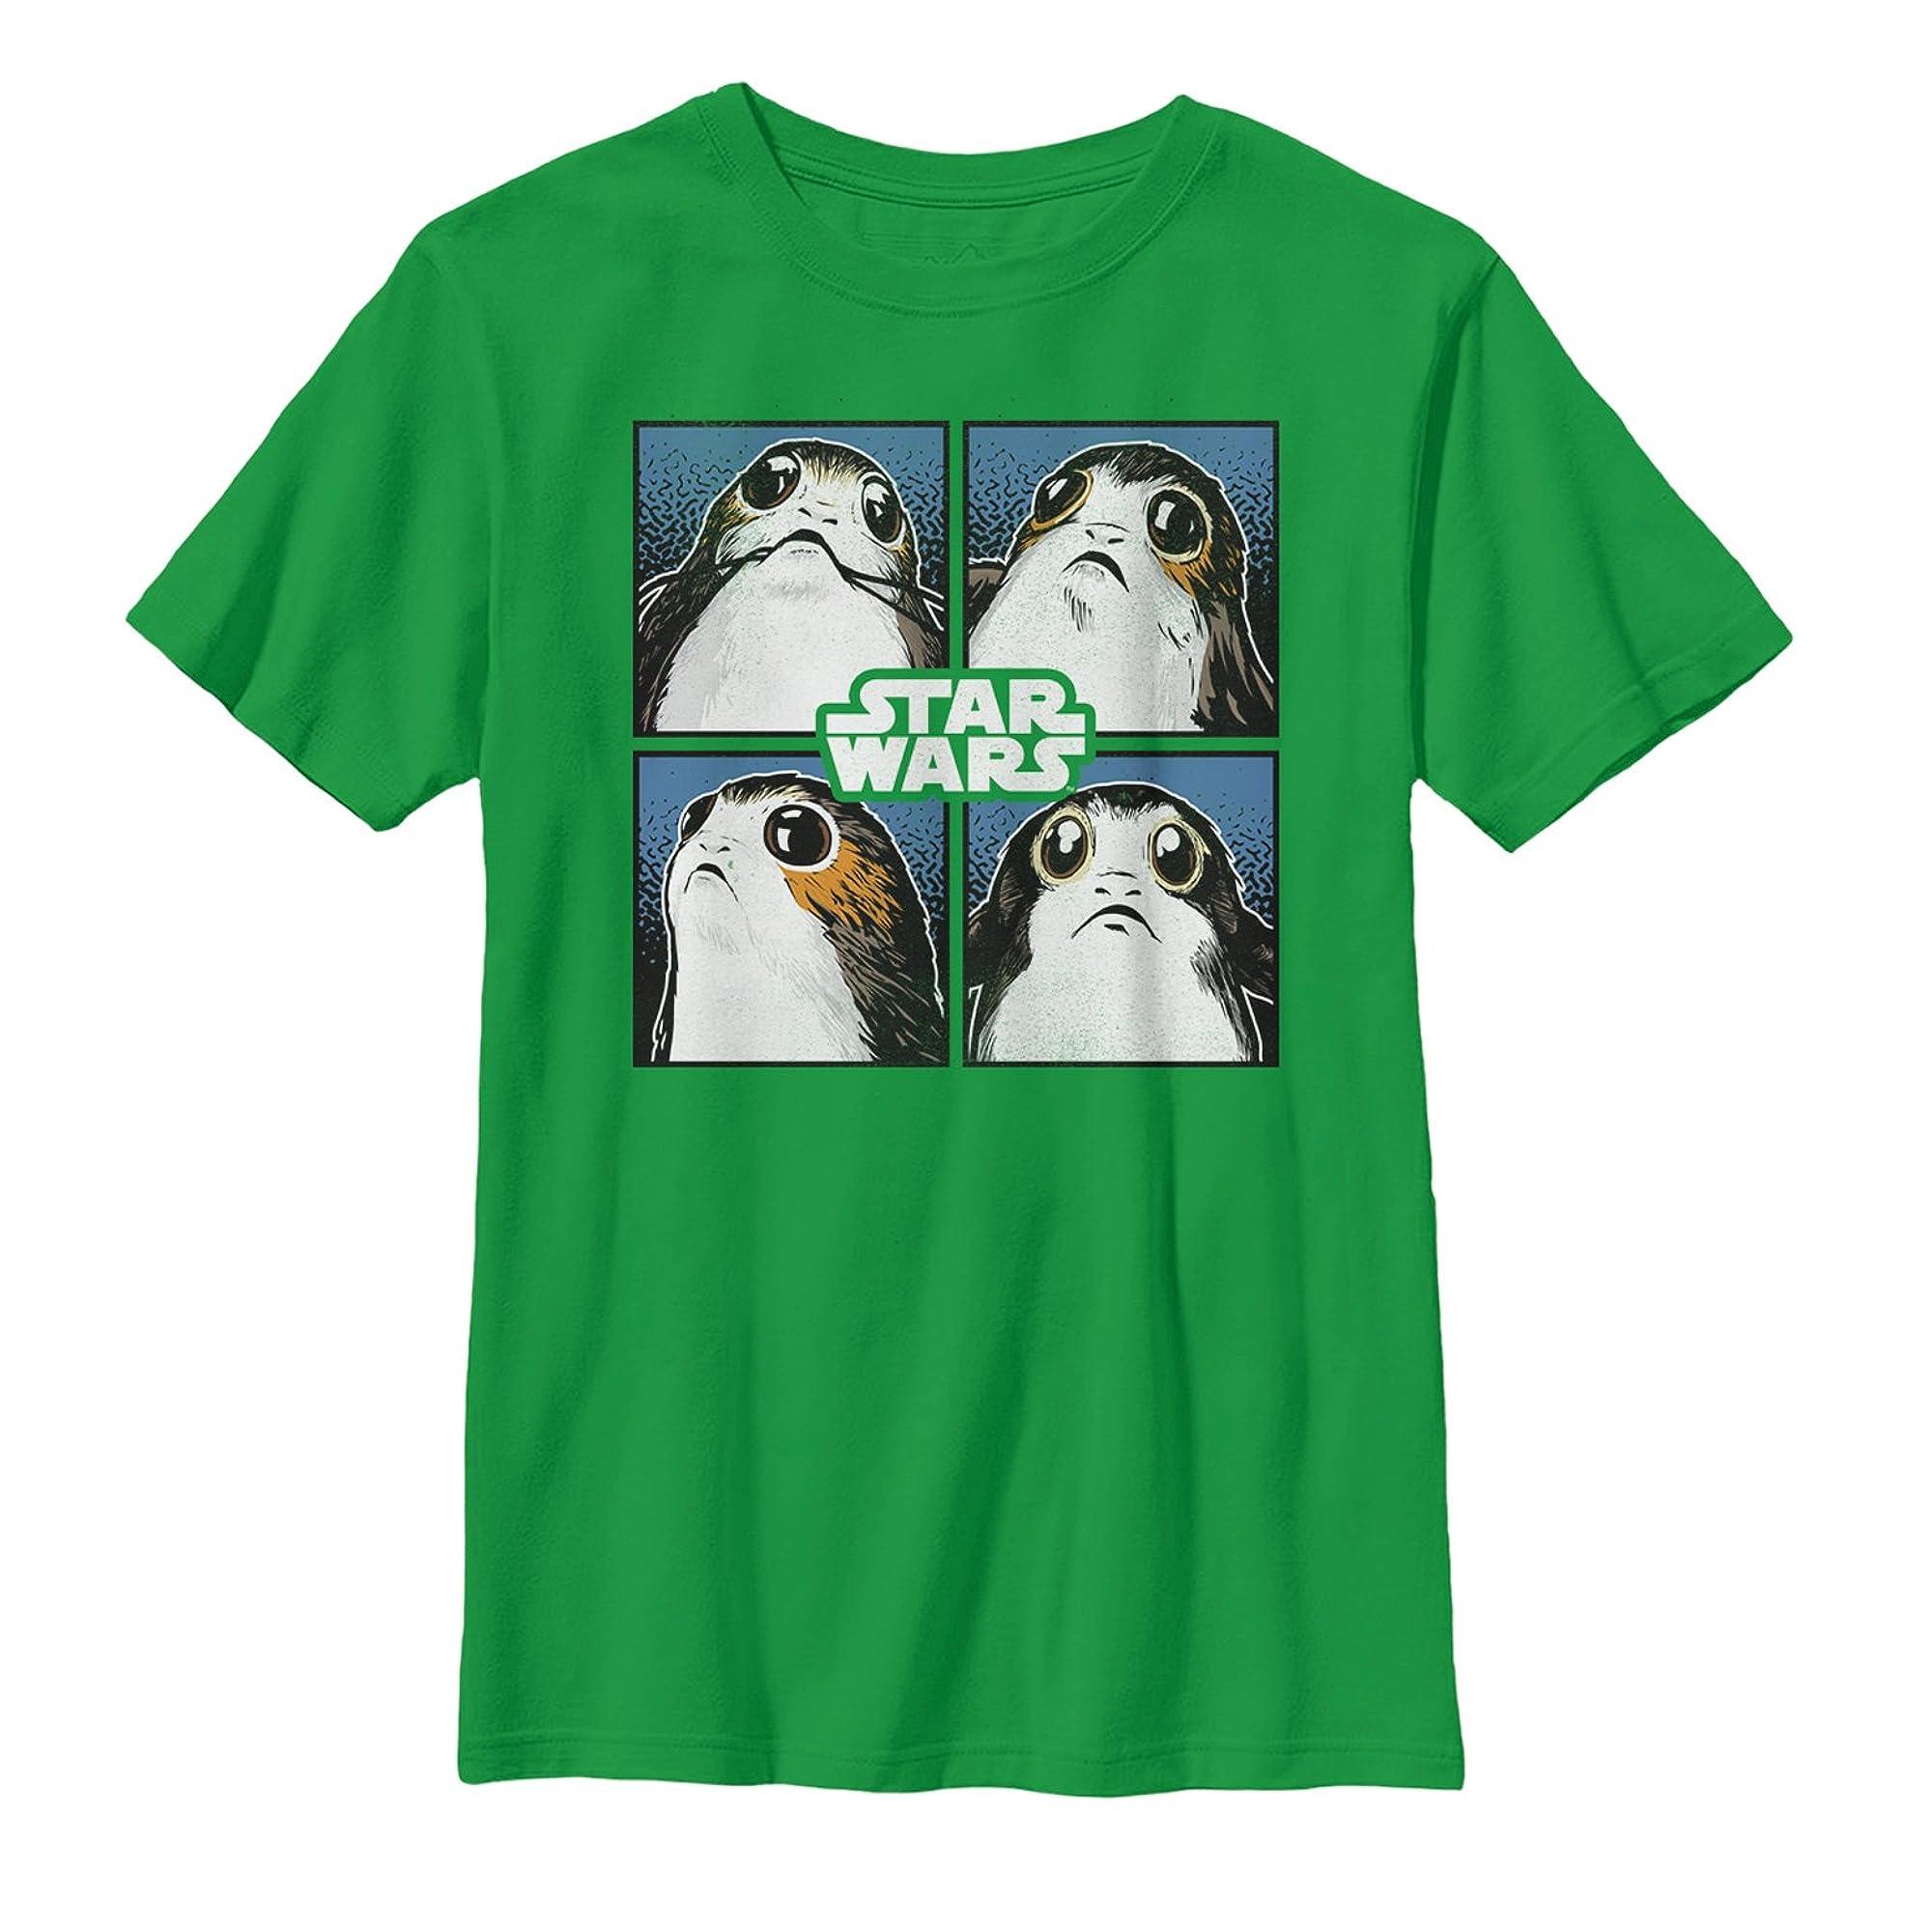 Star Wars The Last Jedi Porg Square Graphic T Shirt